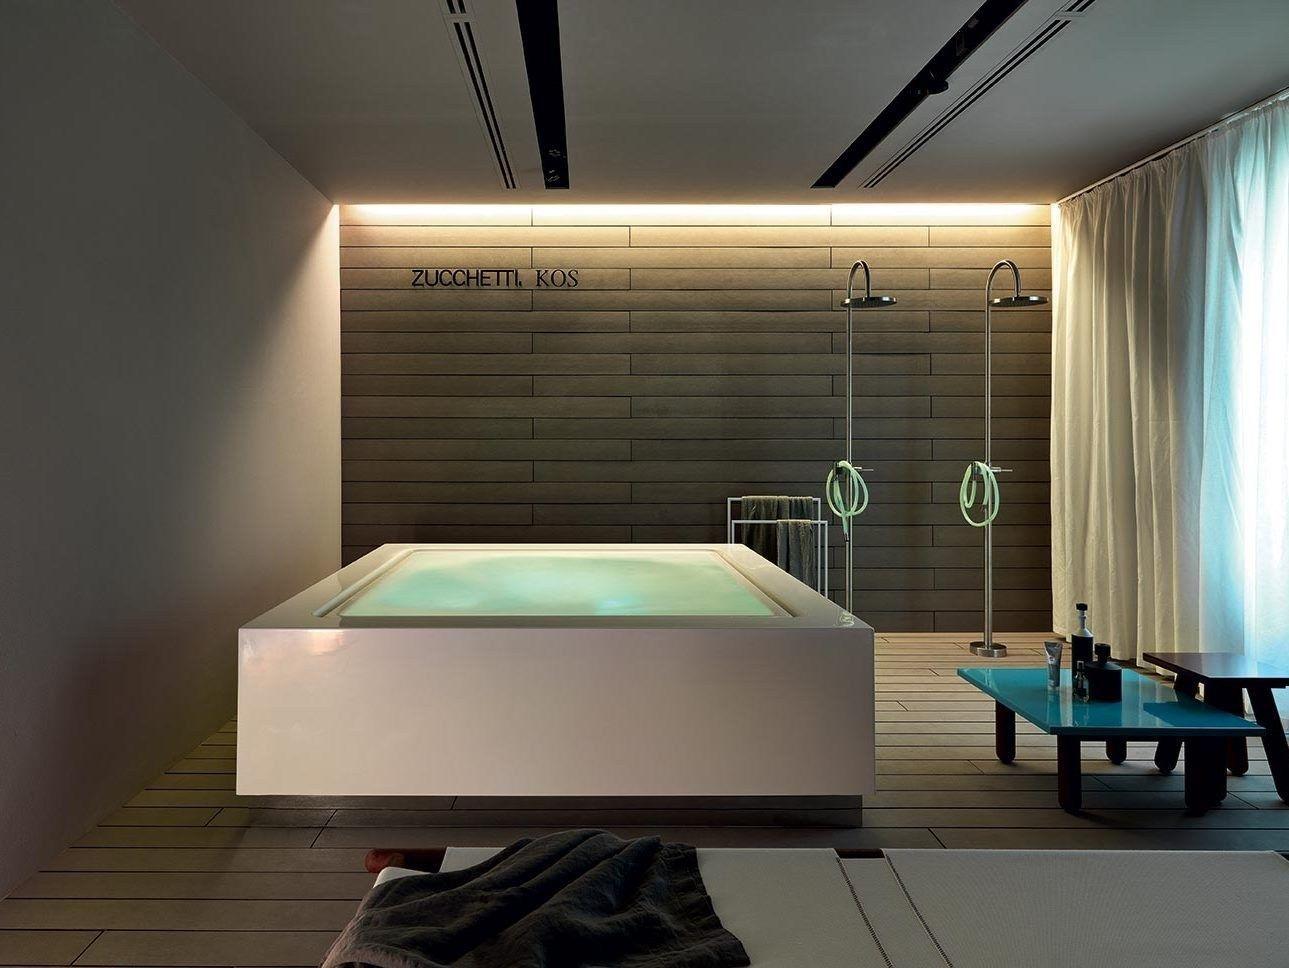 whirlpool mit berlauf f r aussen quadrat minipool. Black Bedroom Furniture Sets. Home Design Ideas